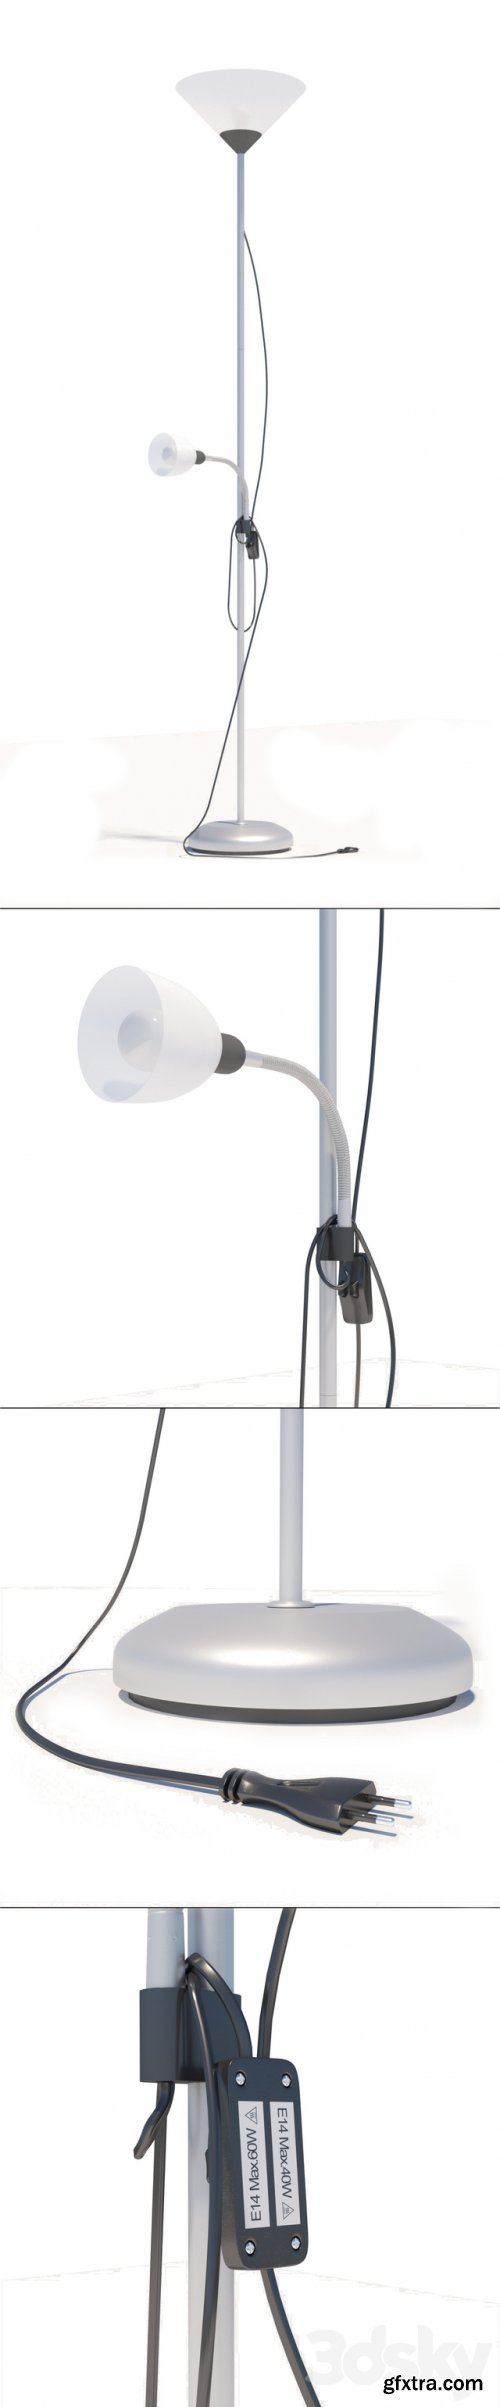 Leroy Merlin Basic floor lamp with reading lamp